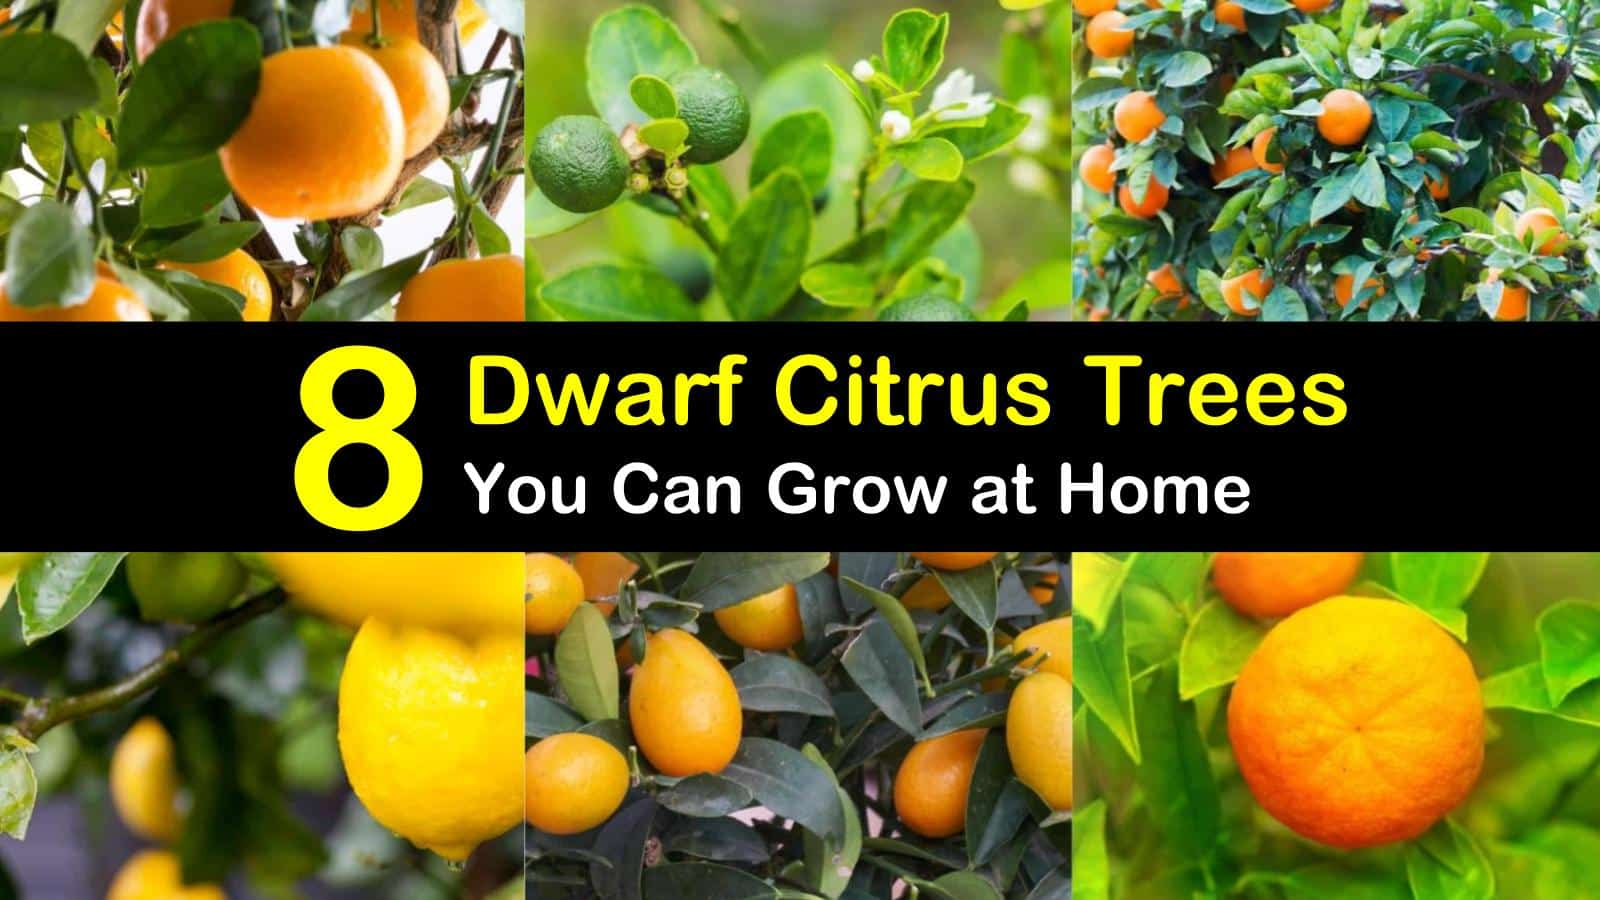 dwarf citrus trees titleimg1